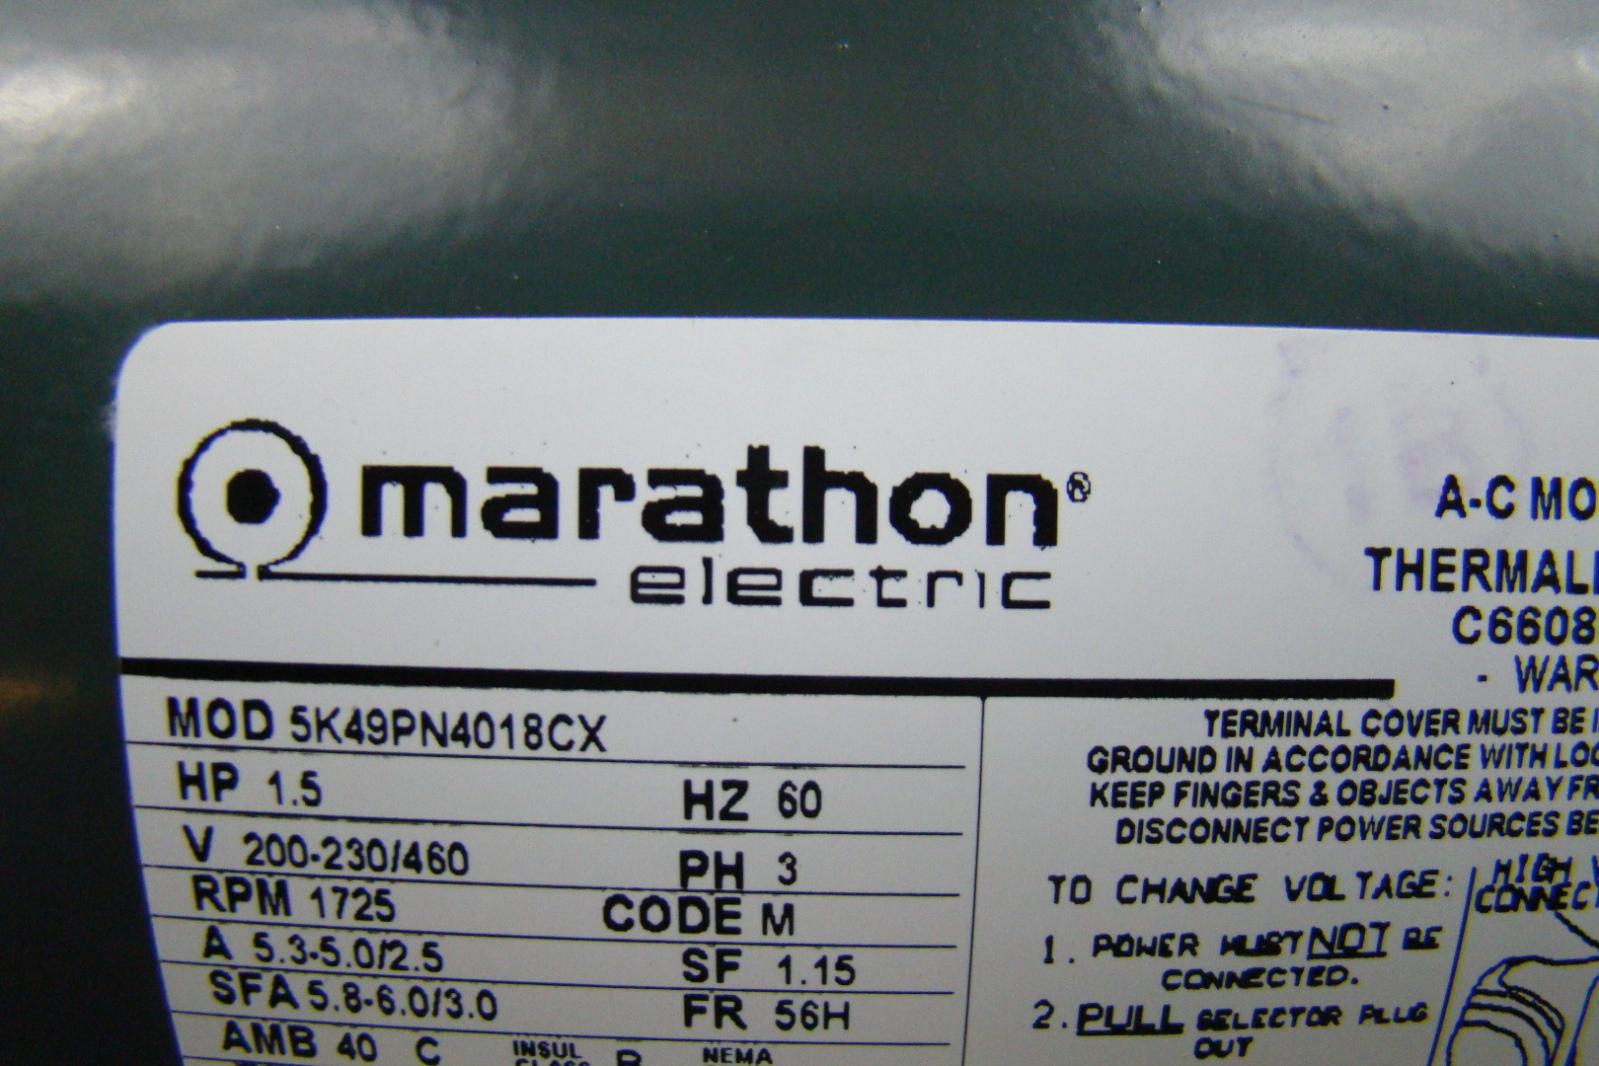 Electric Motor Marathon 3 Phase Wiring Diagram Pictures